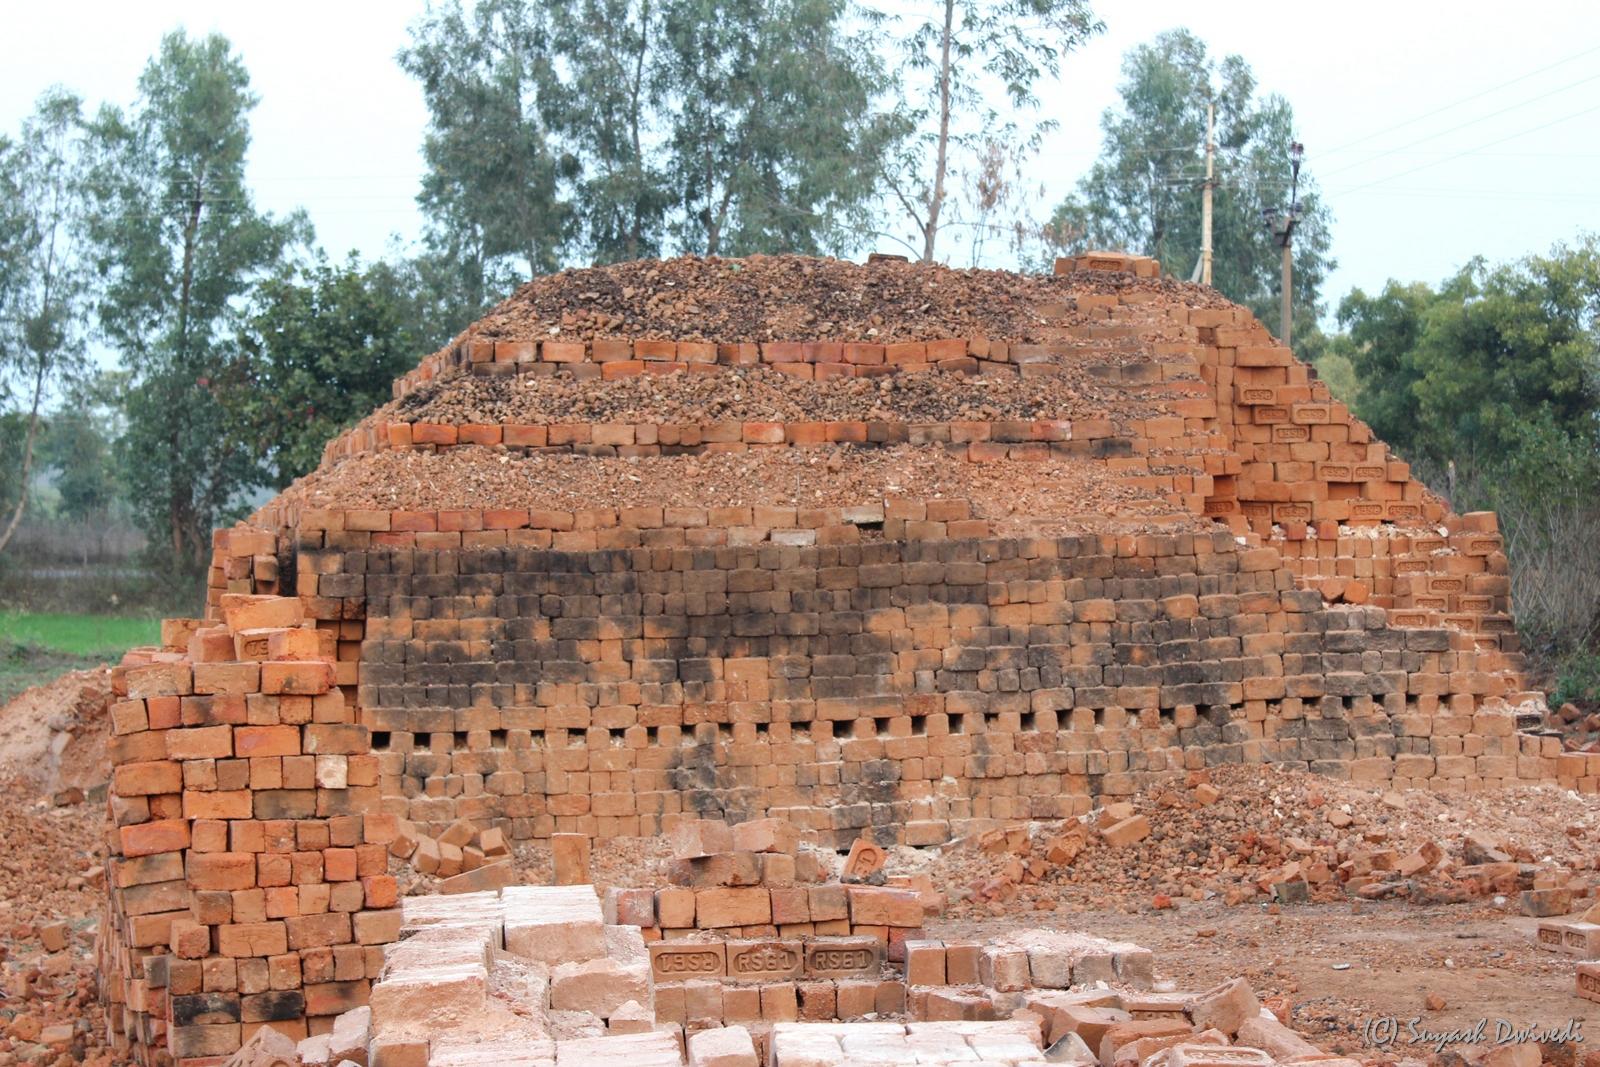 Why India's brick kiln workers 'live like slaves'